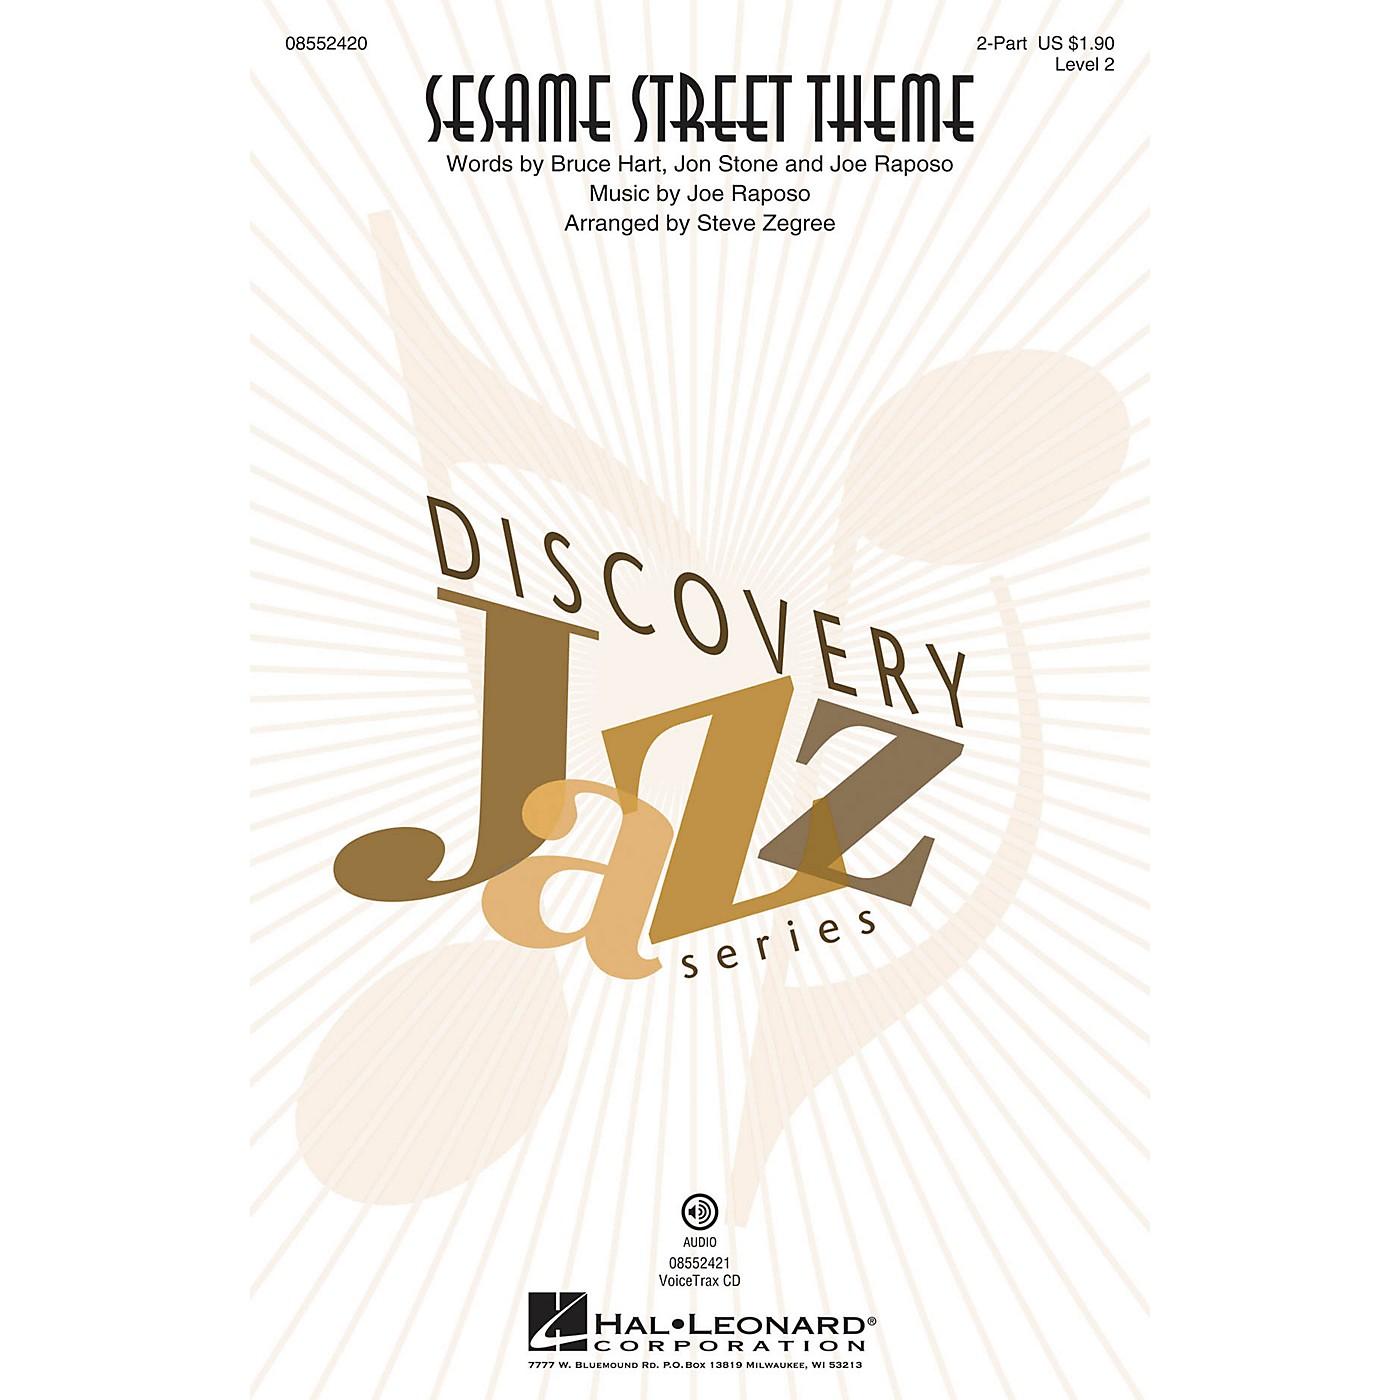 Hal Leonard Sesame Street Theme (Discovery Level 2) VoiceTrax CD Arranged by Steve Zegree thumbnail